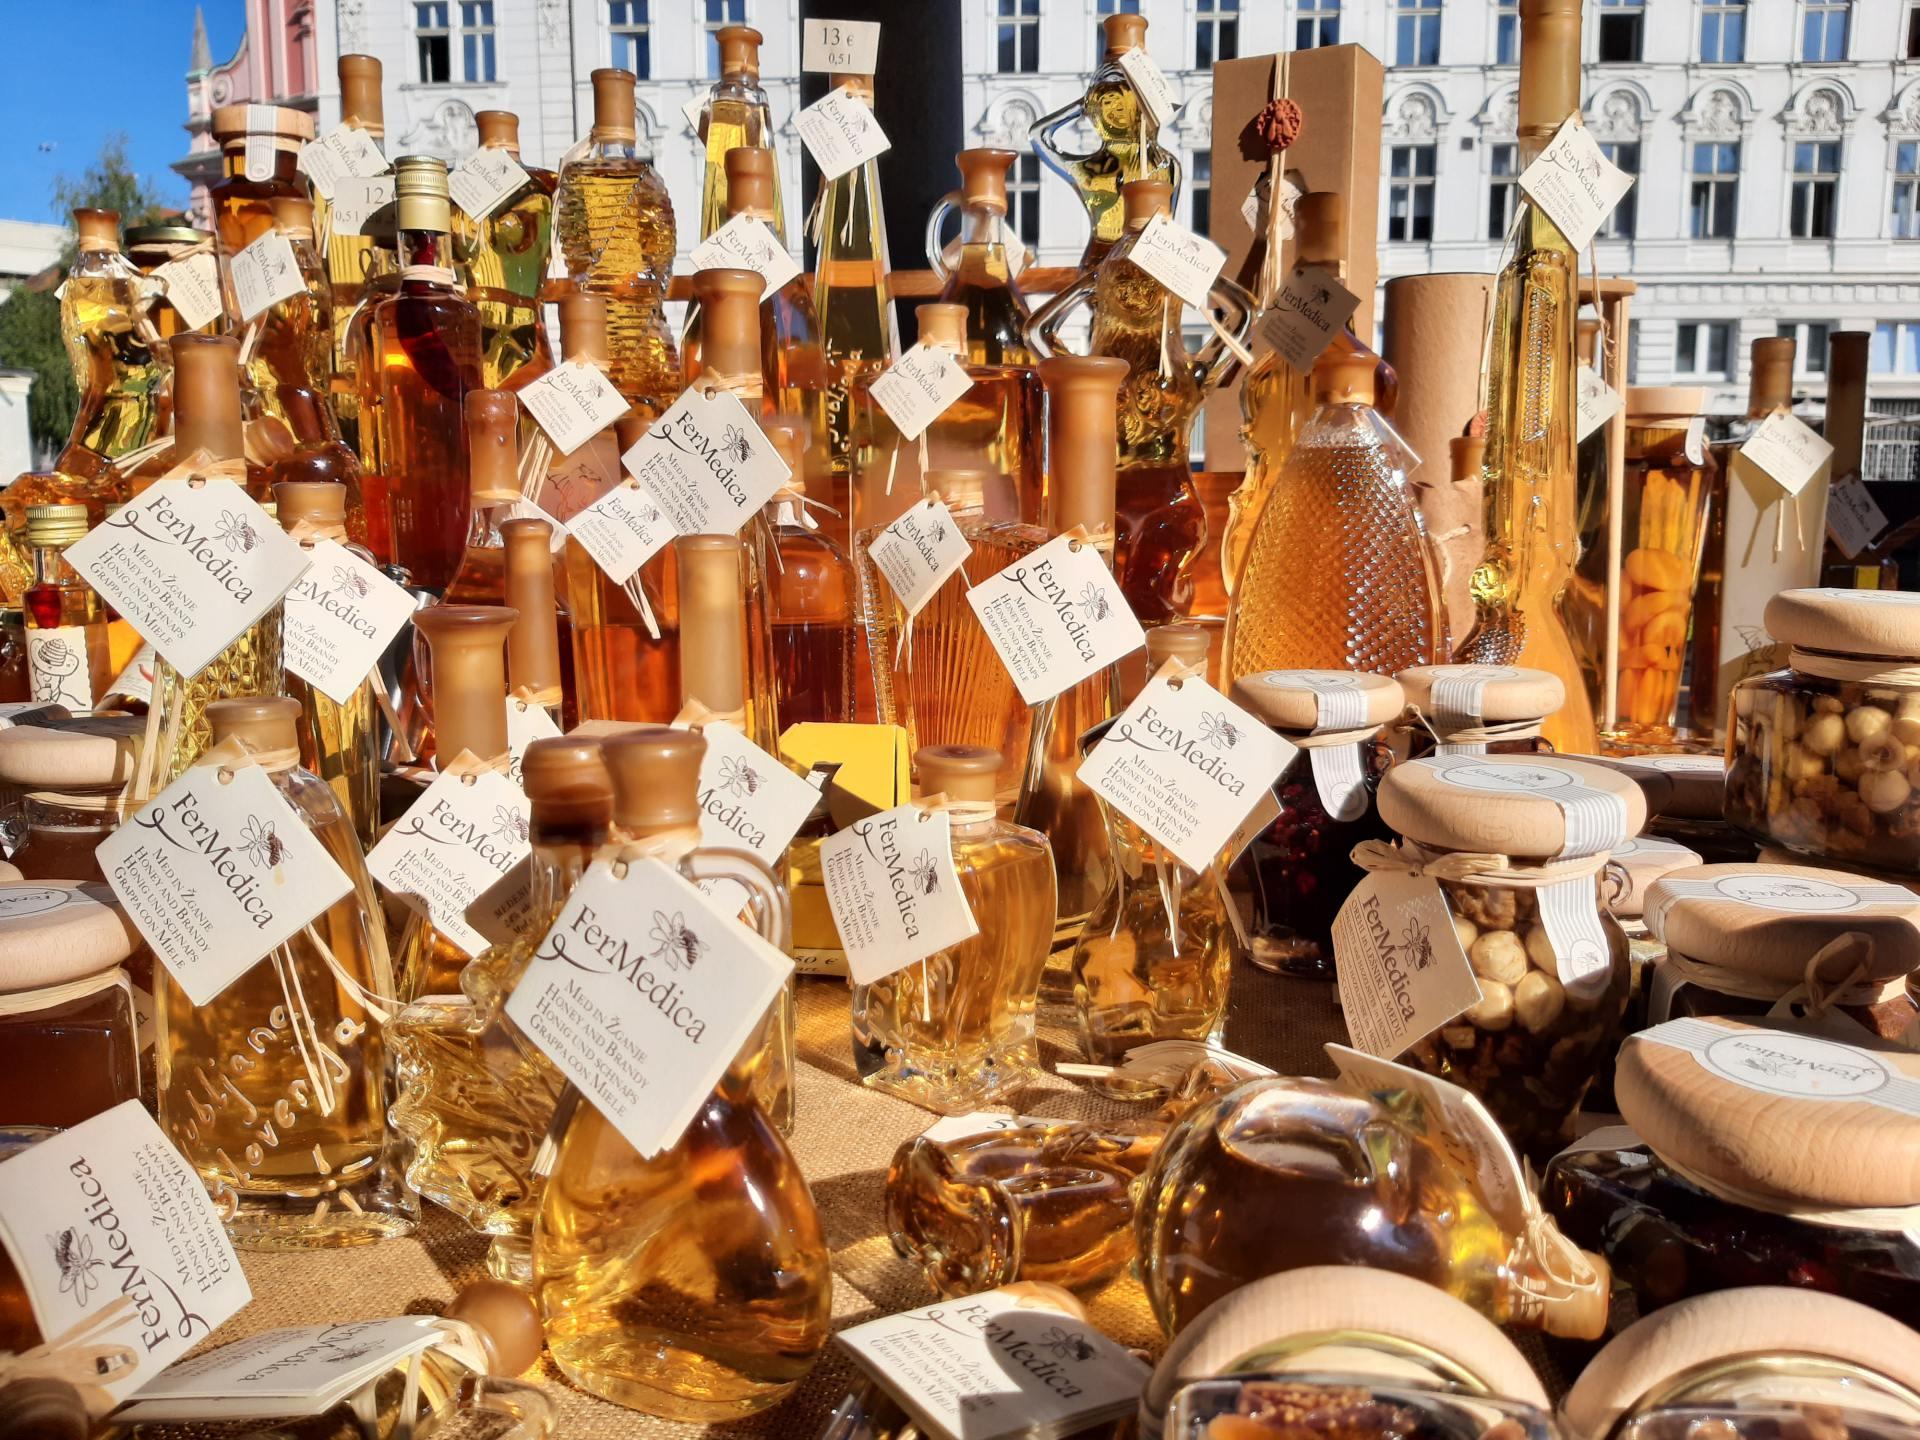 Privacy policy – Fermedica, David Ferle s.p. - Honey brandy, honey, mead